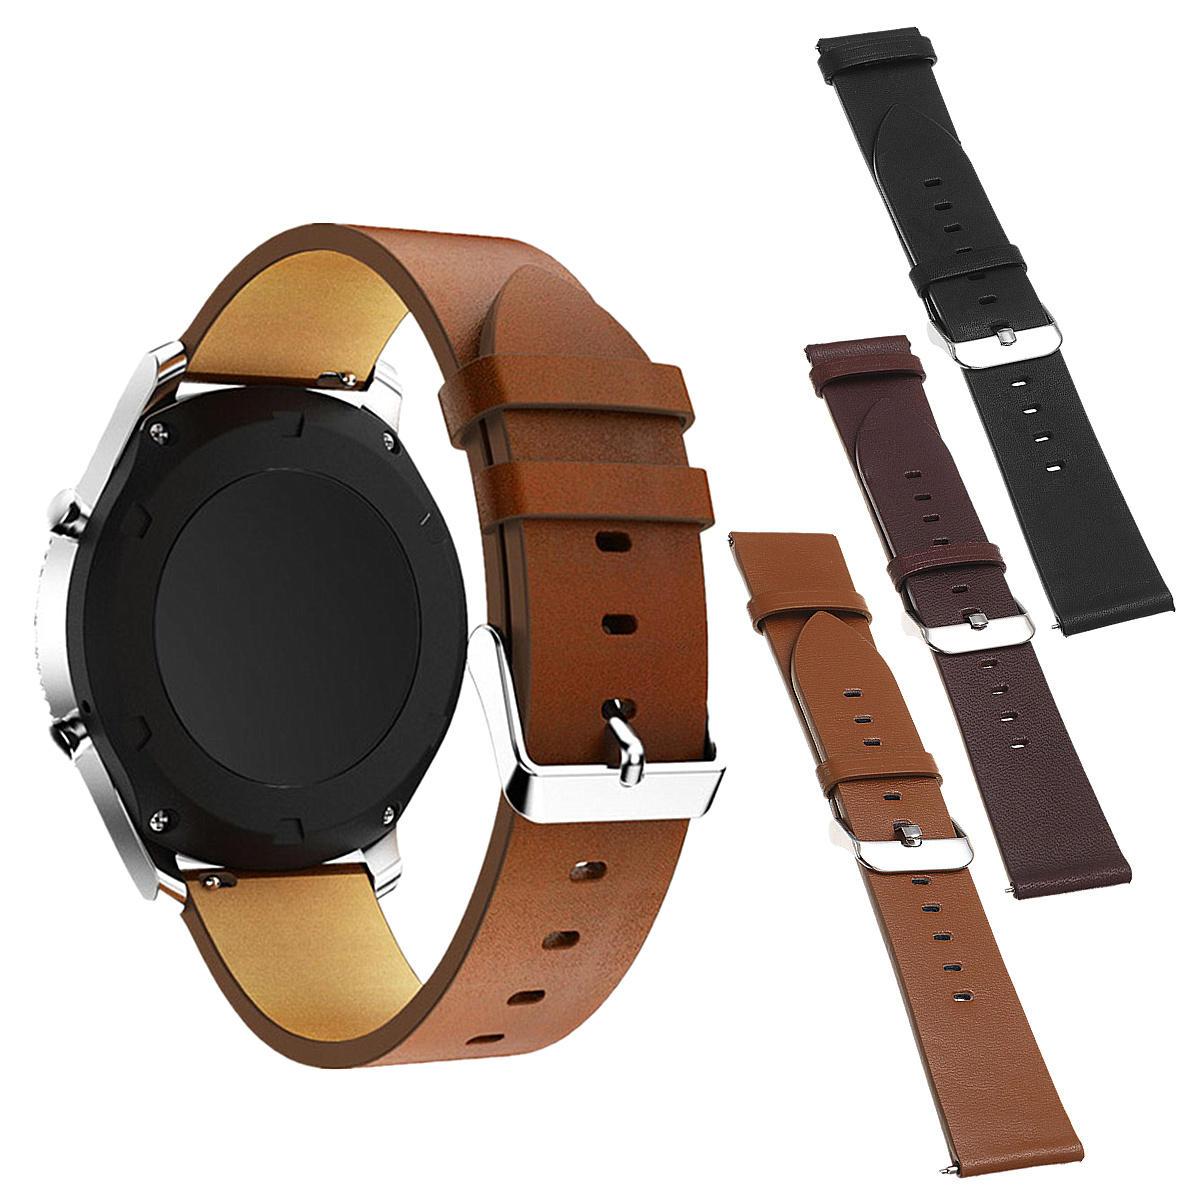 22мм кожаные часы Стандарты Ремень для Samsung Gear S3 Frontier / Classic